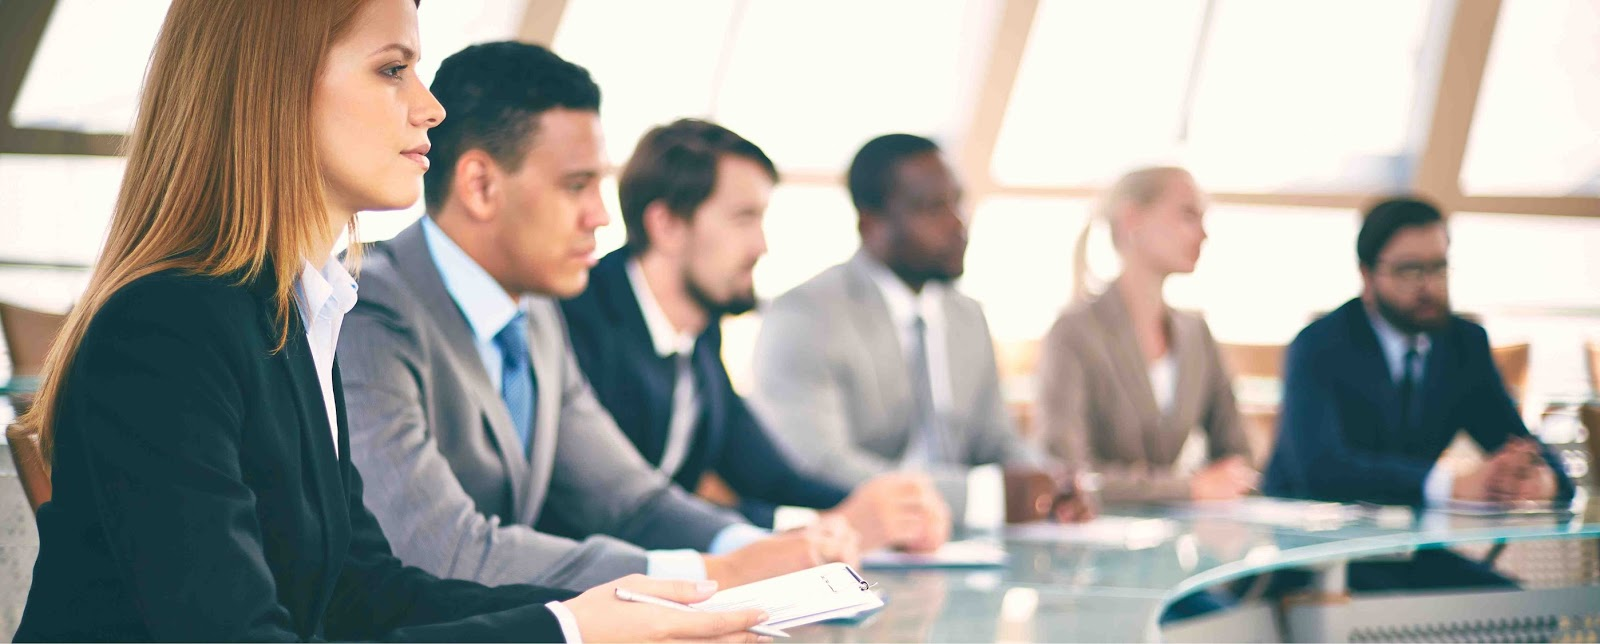 recruiting trends 2015 you should follow resume writing tips